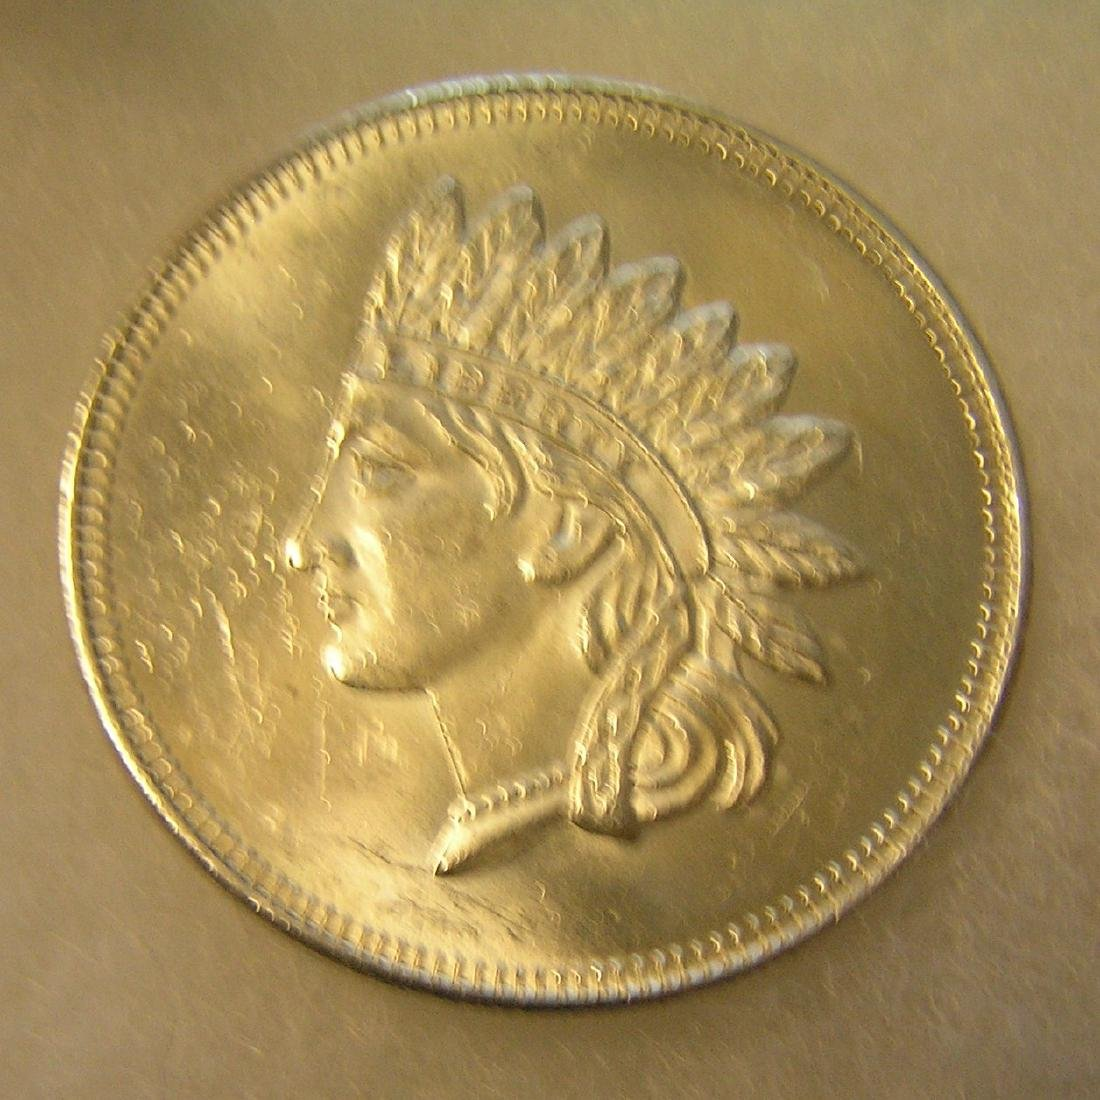 Indian head 1 ounce fine silver commemorative coin